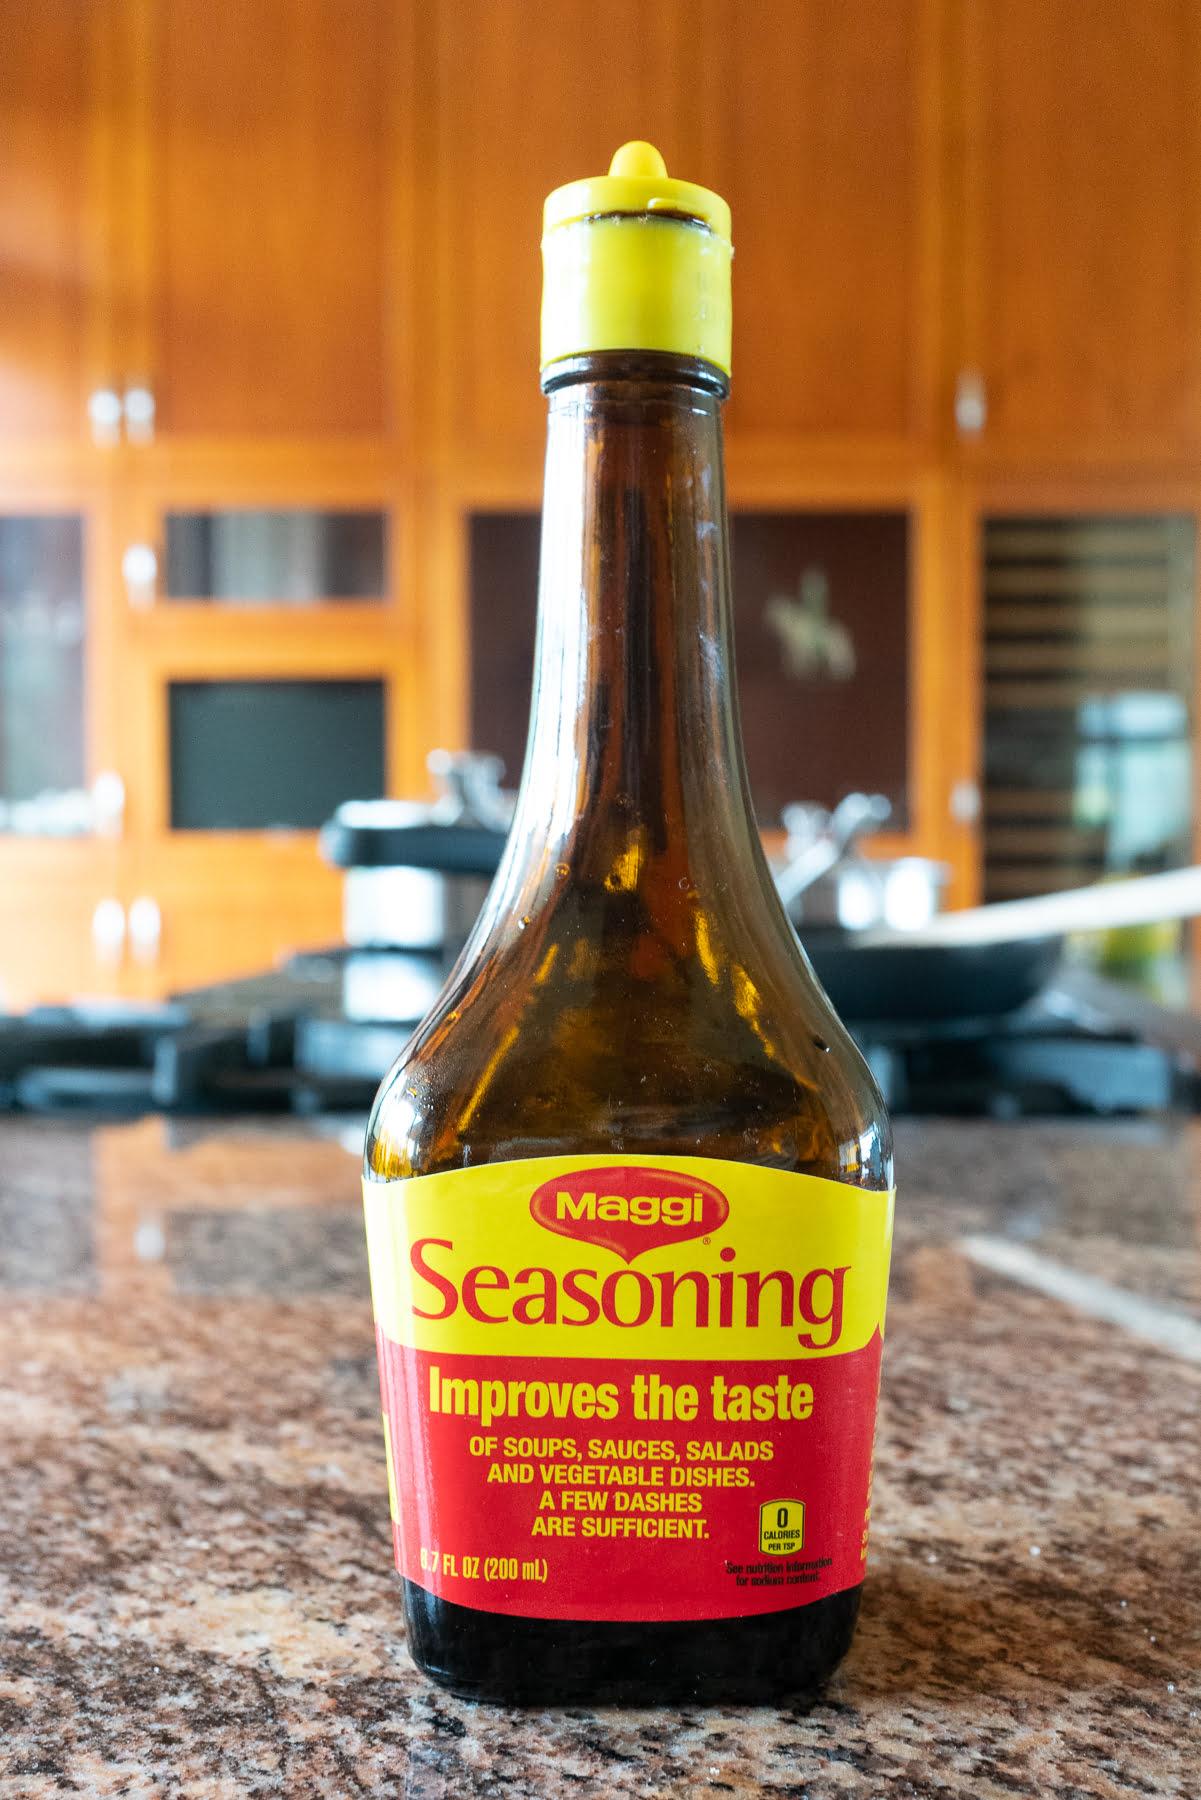 A bottle of Maggi seasoning